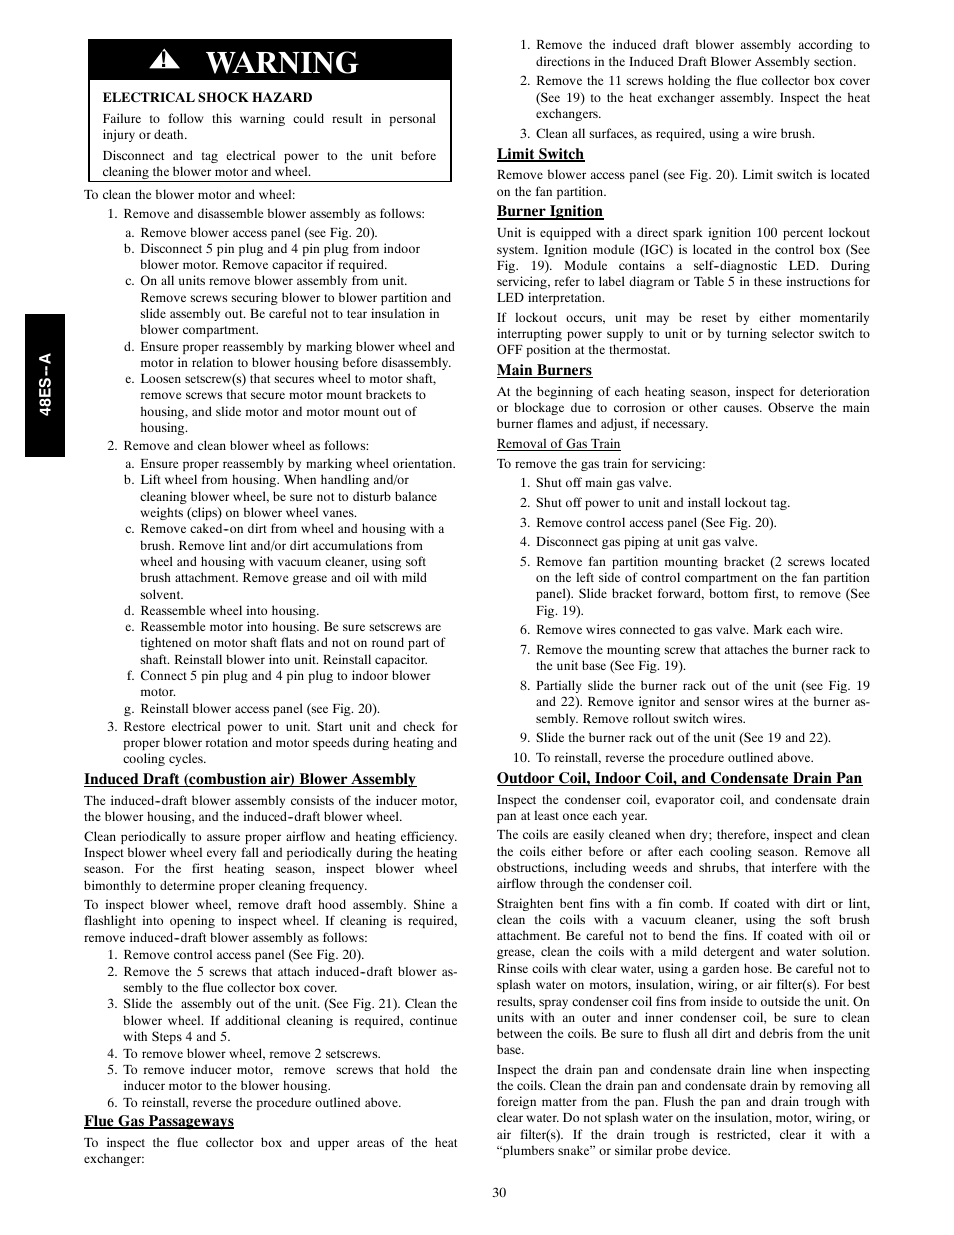 Carrier 48es Wiring Diagram Free Download Diagrams Pdf Warning A User Manual Page 30 38 At